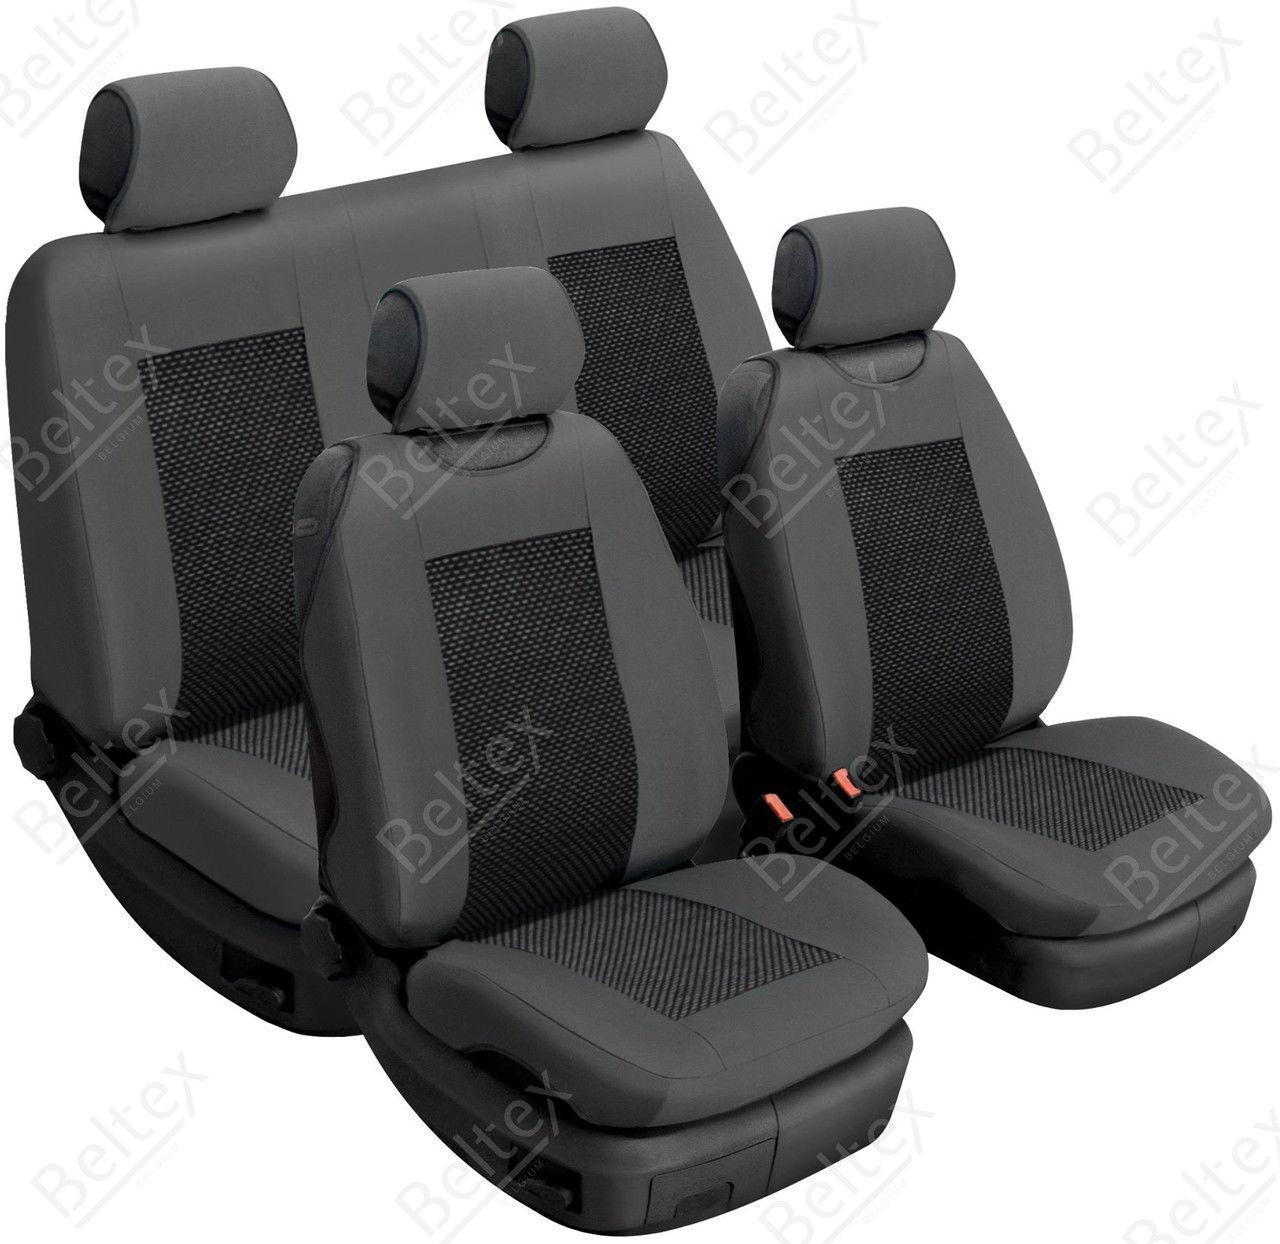 Майки/чехлы на сиденья Сеат Кордоба 2 (Seat Cordoba II)